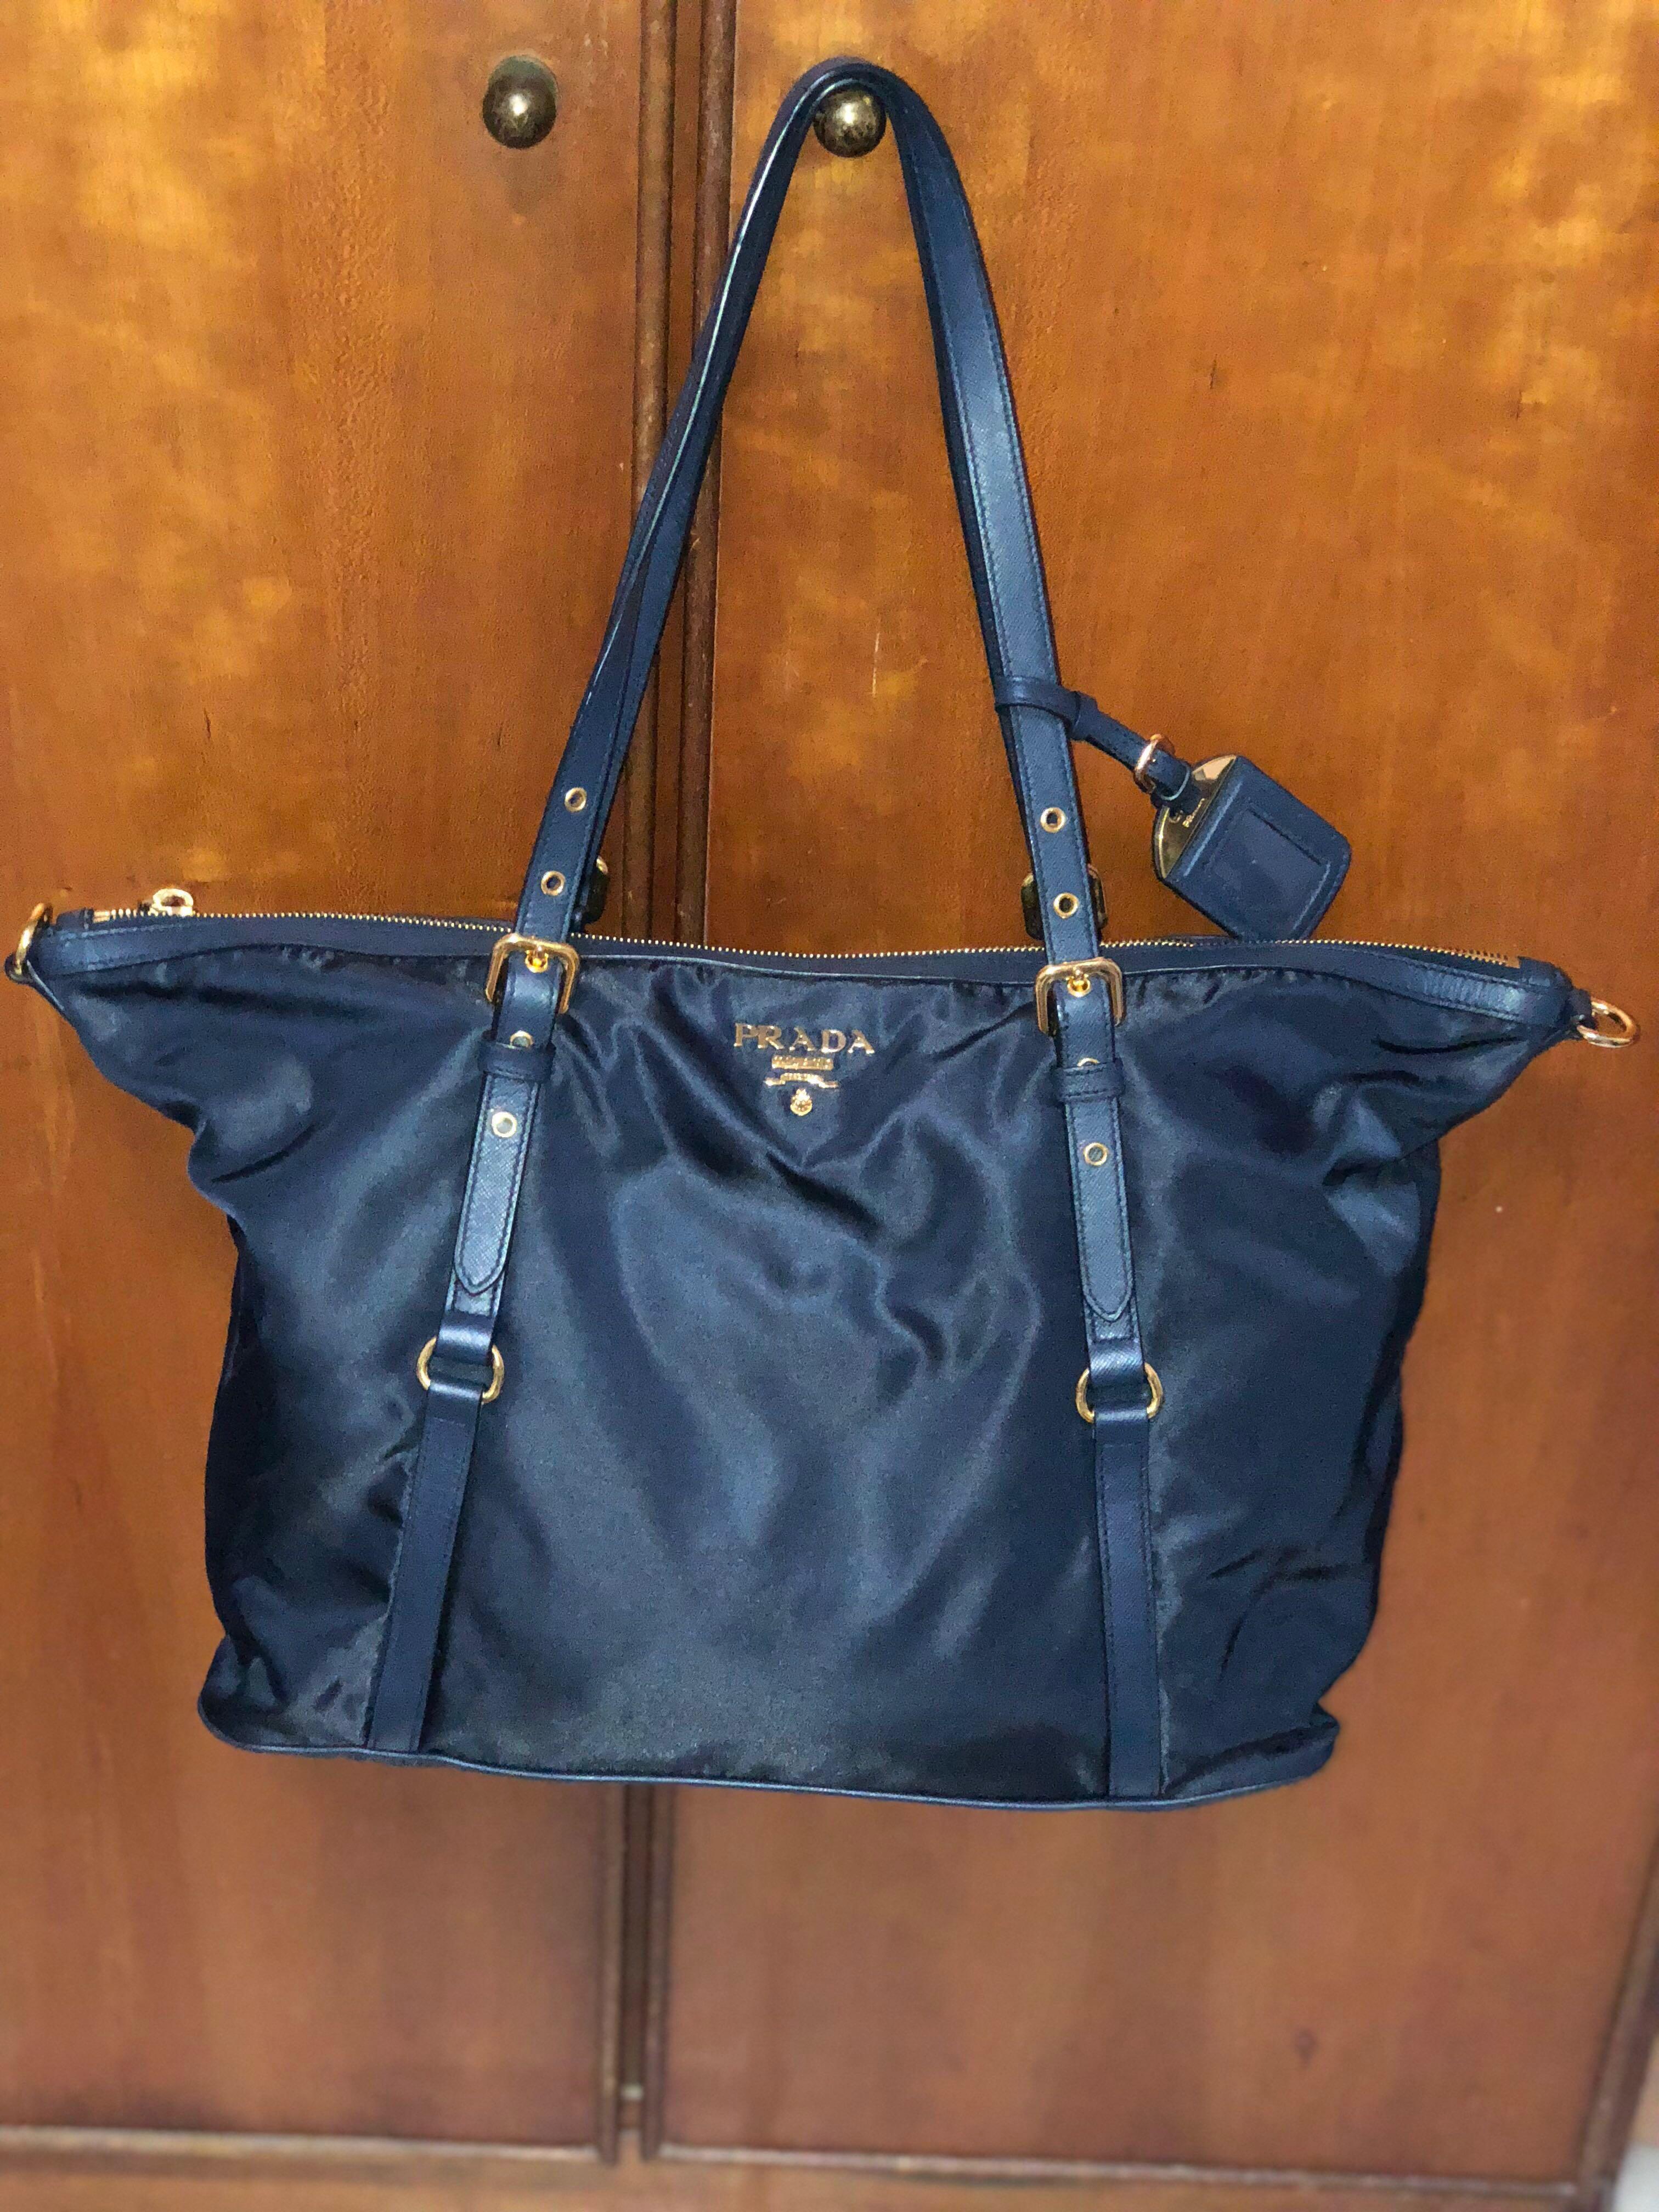 ad50cd63a4 Prada BR4253 Nylon Tote Bag